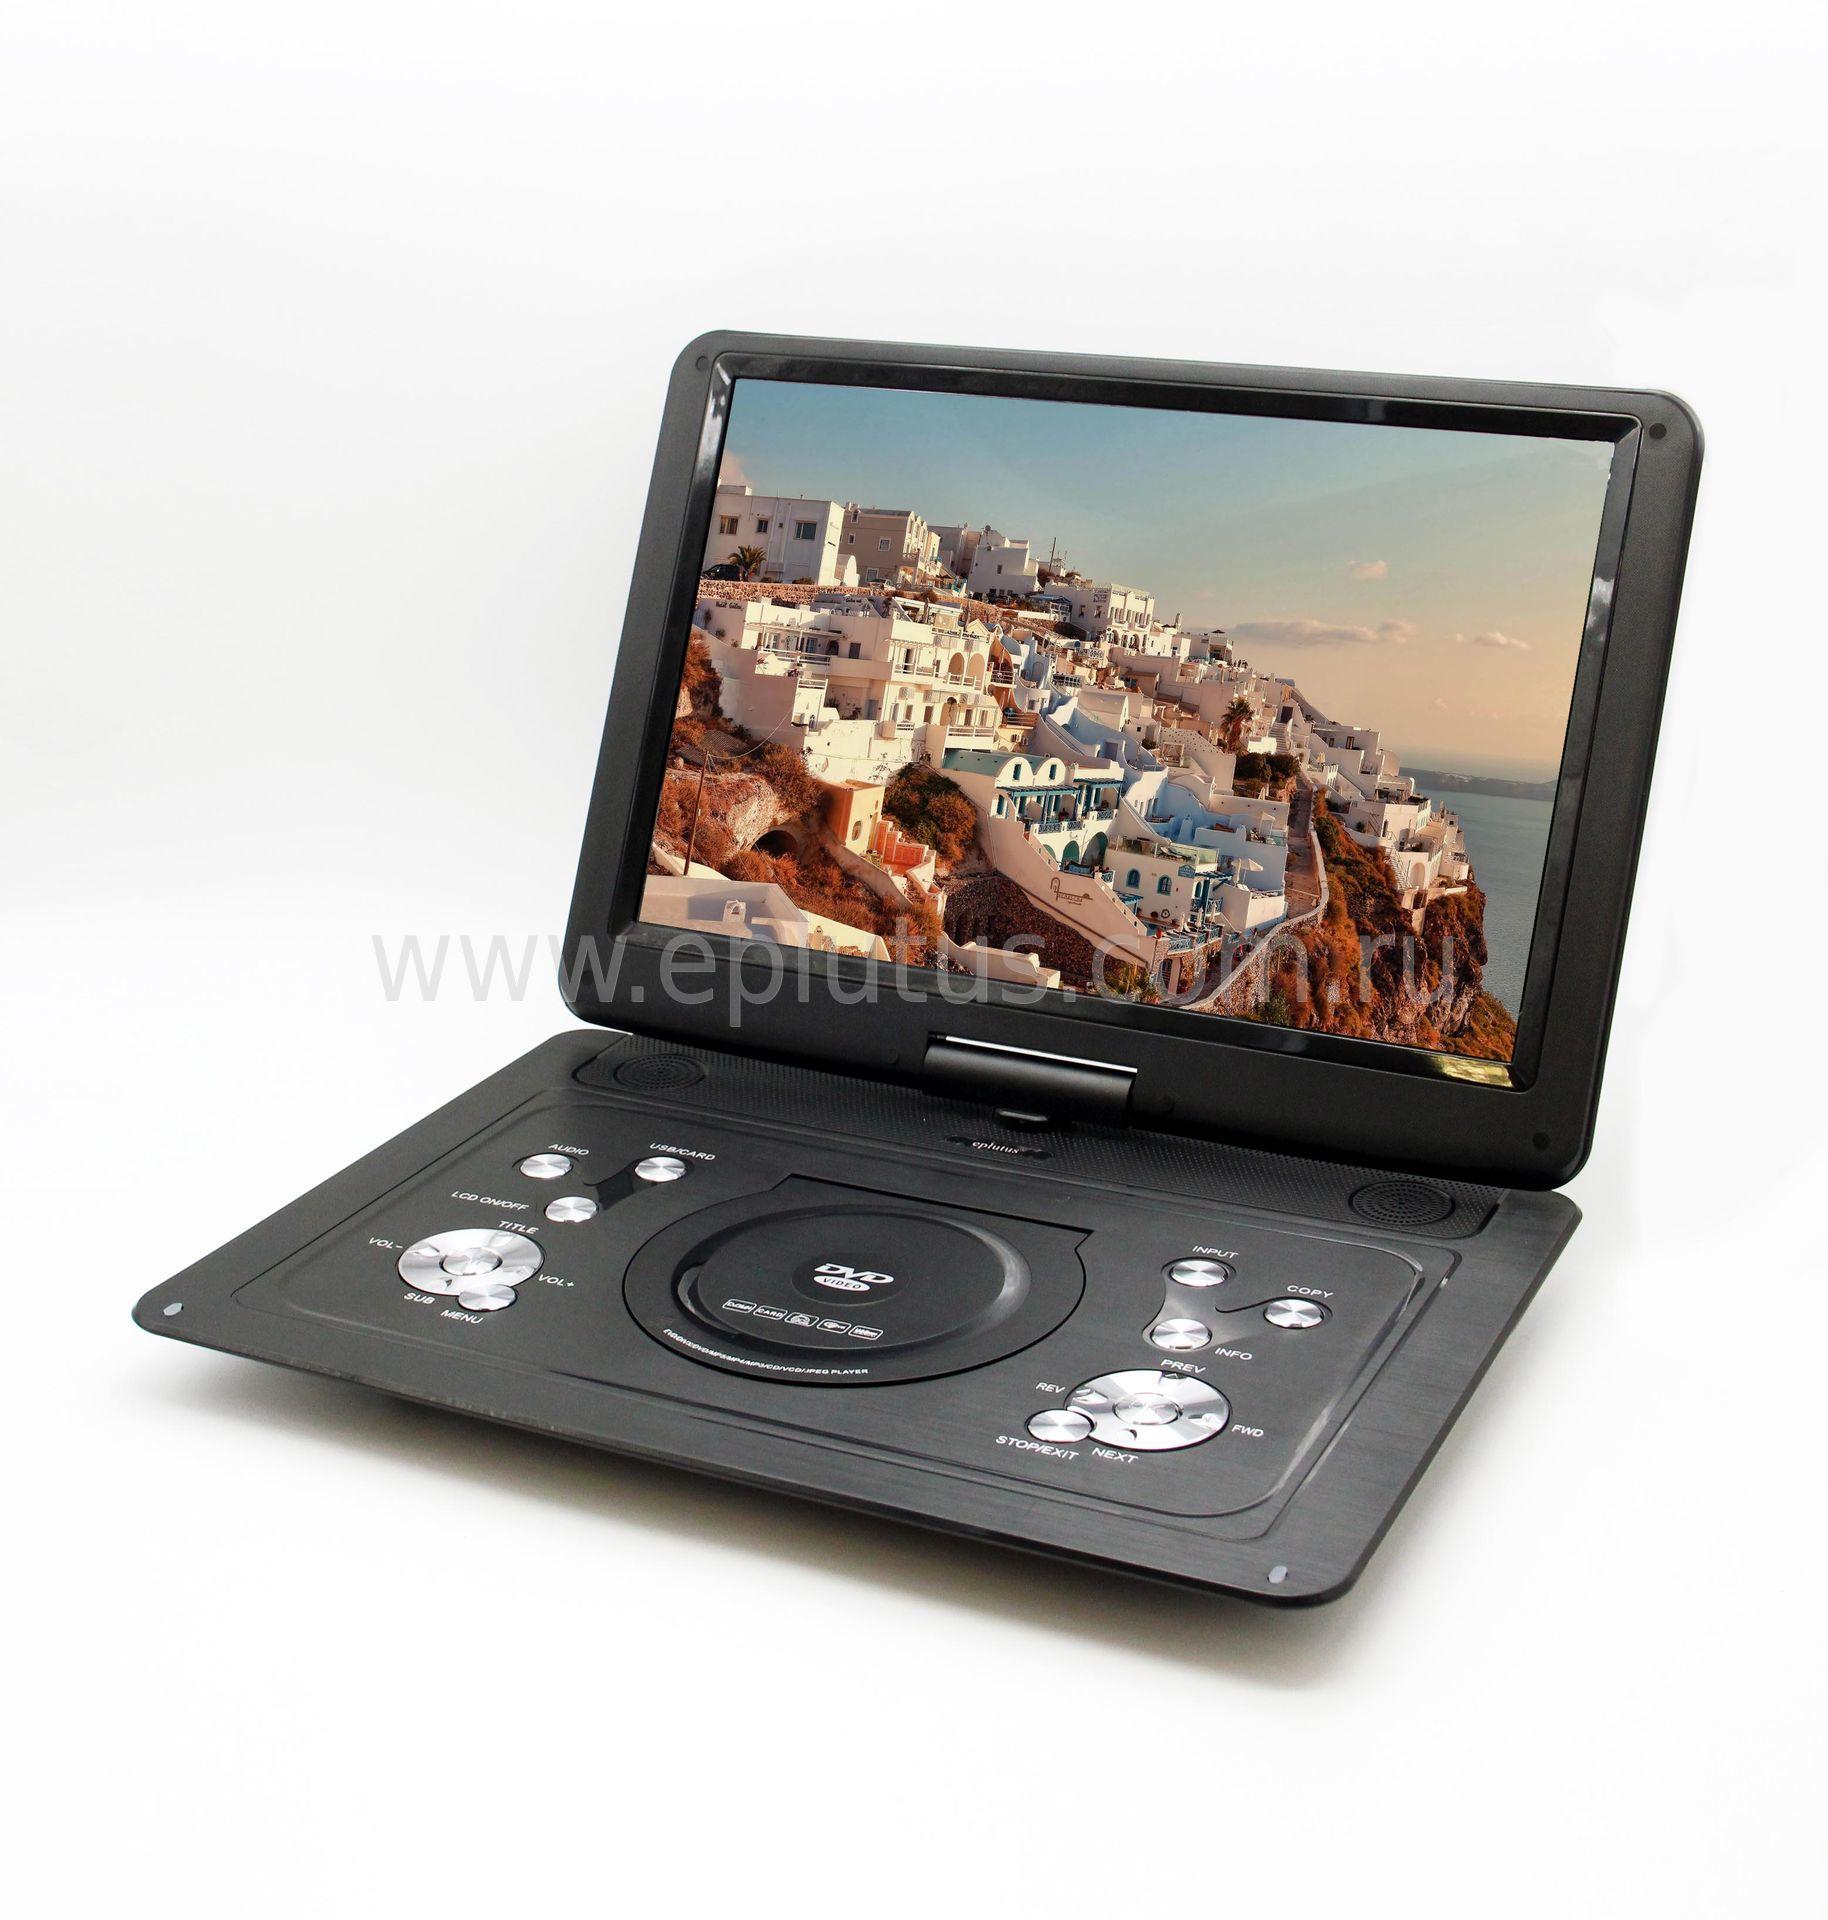 Eplutus EP-1516T dvd плеер malata pdvd 830 проигрыватель cd проигрывателей qiaohu vcd проигрыватель dvd проигрывателя usb плеер черный